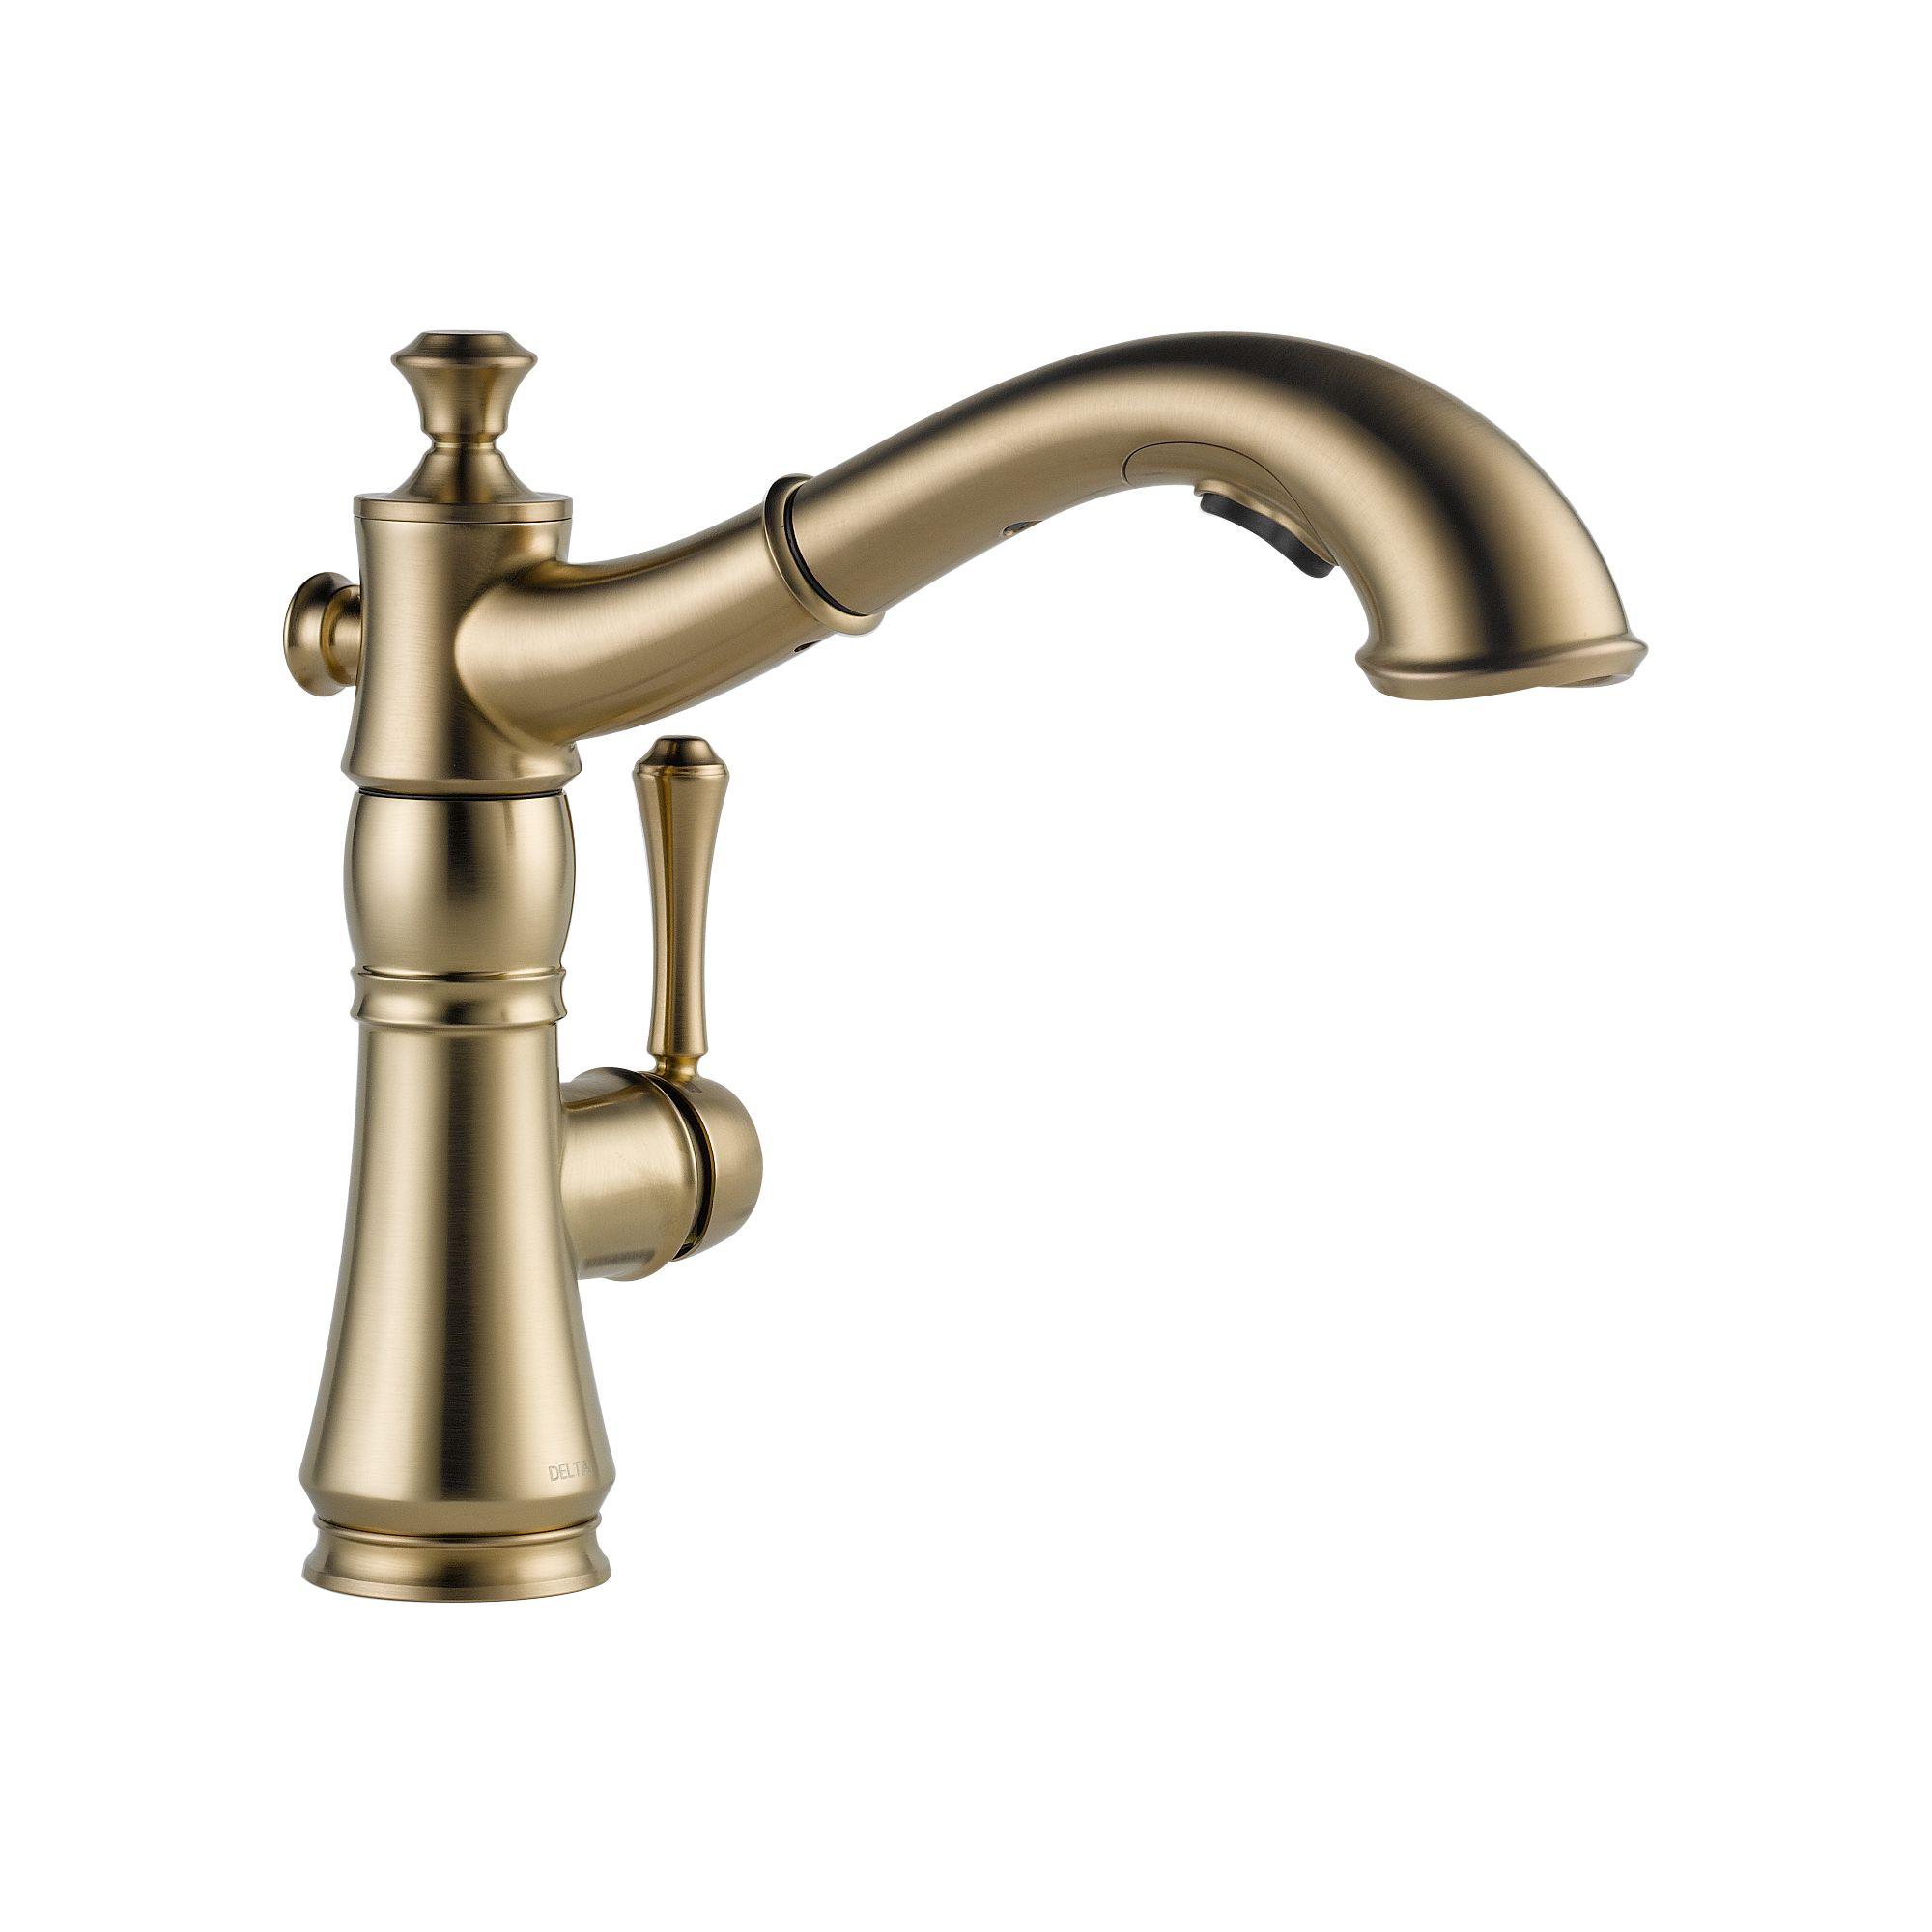 Delta Pull Out Kitchen Faucet Delta 4197 Dst Cassidy Single Handle Pull Out Kitchen Faucet 4197